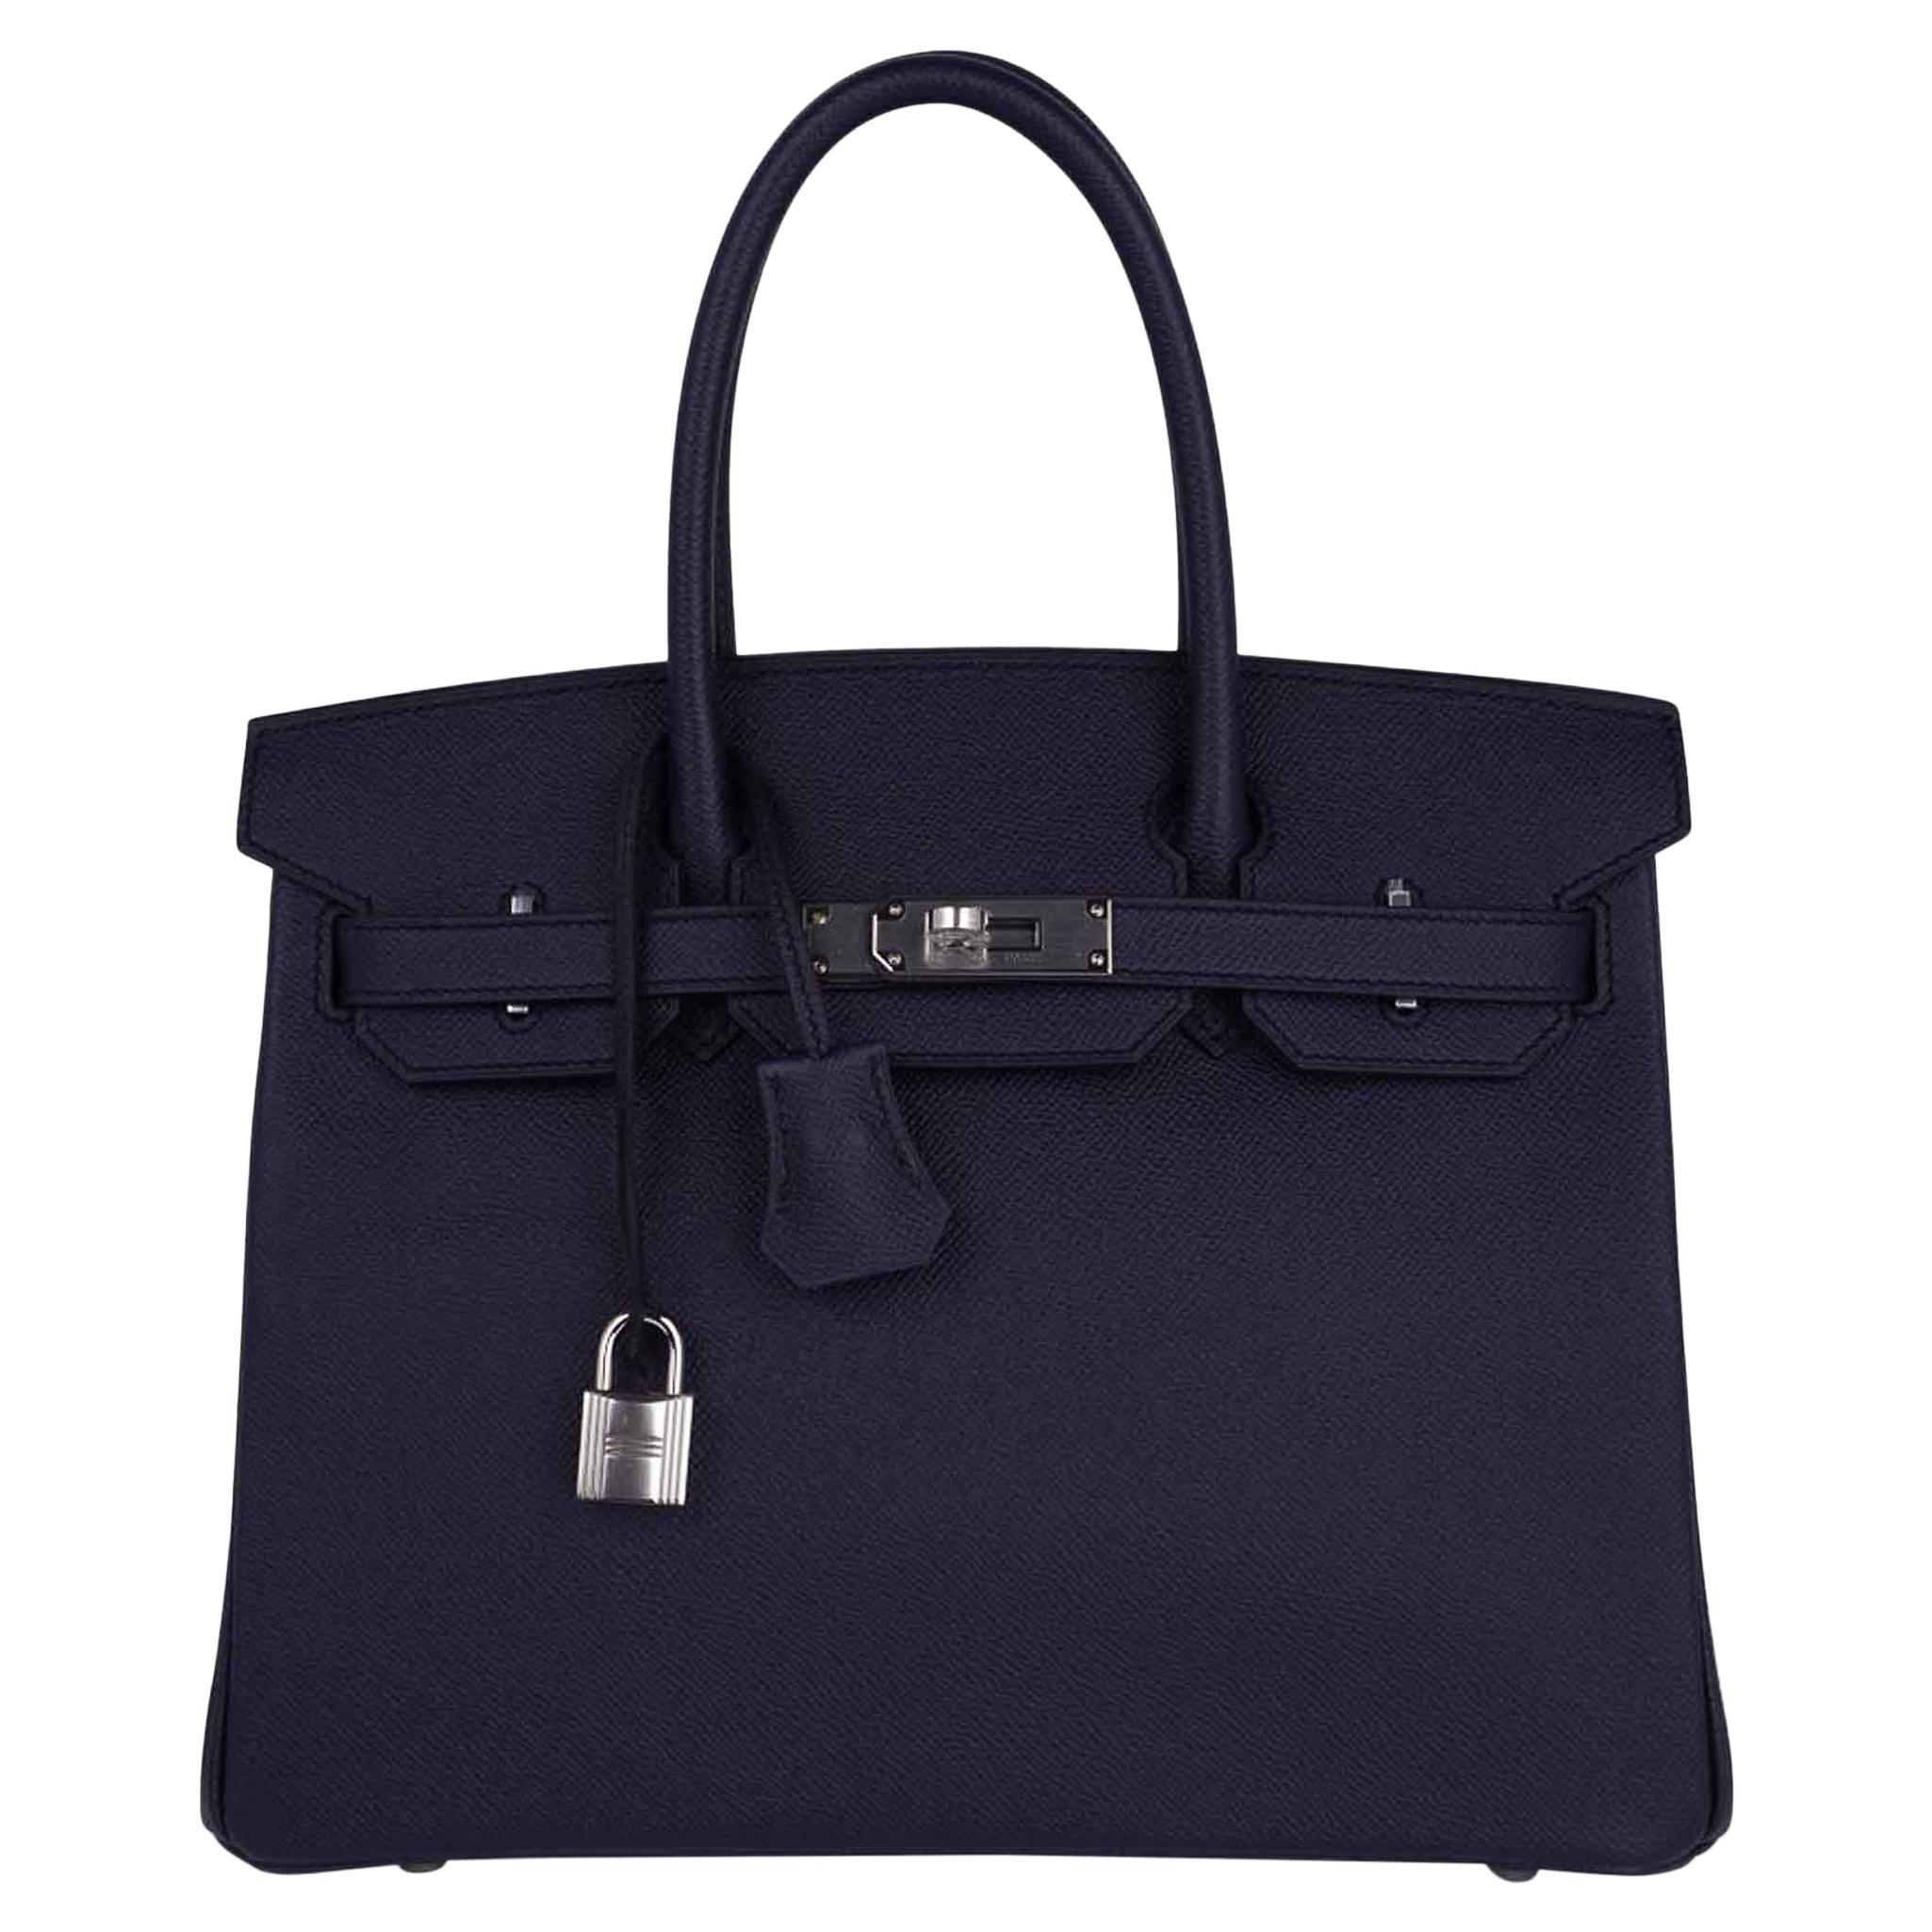 Hermes Birkin 30 Bag Indigo Epsom Palladium Hardware New w/ Box